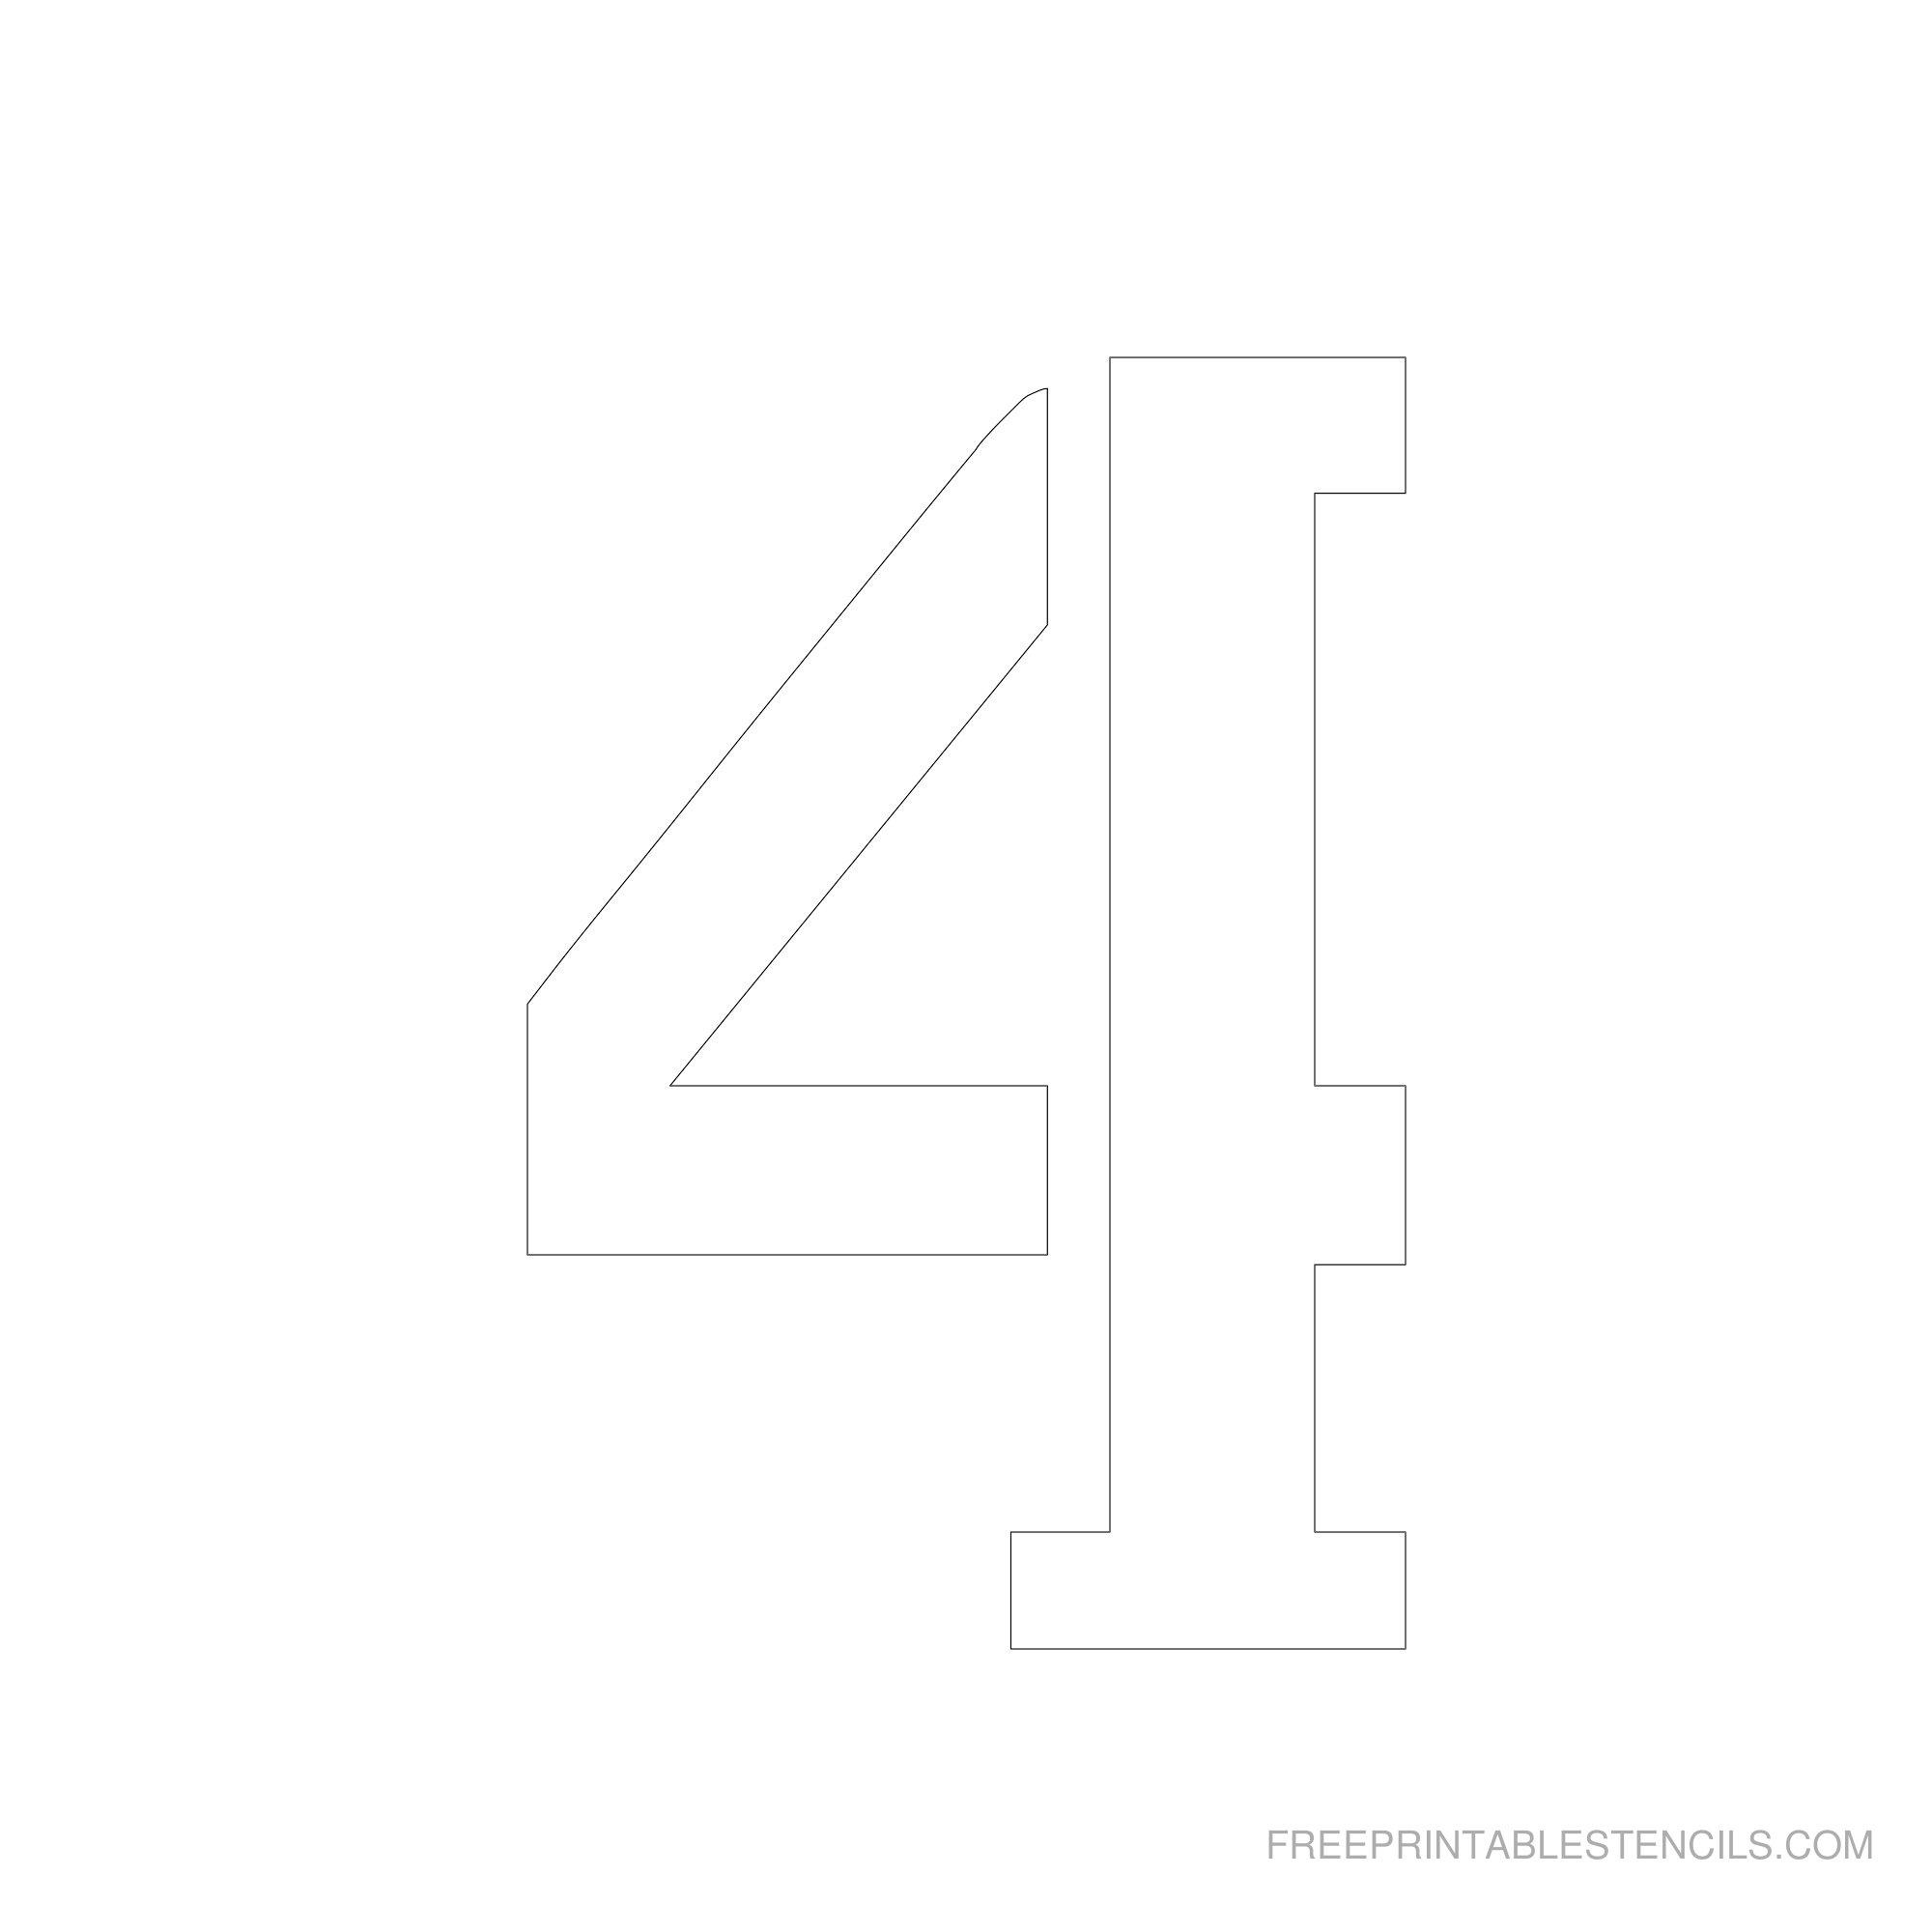 Printable 6 Inch Number Stencils 1-10 | Free Printable Stencils - Free Printable Number Stencils